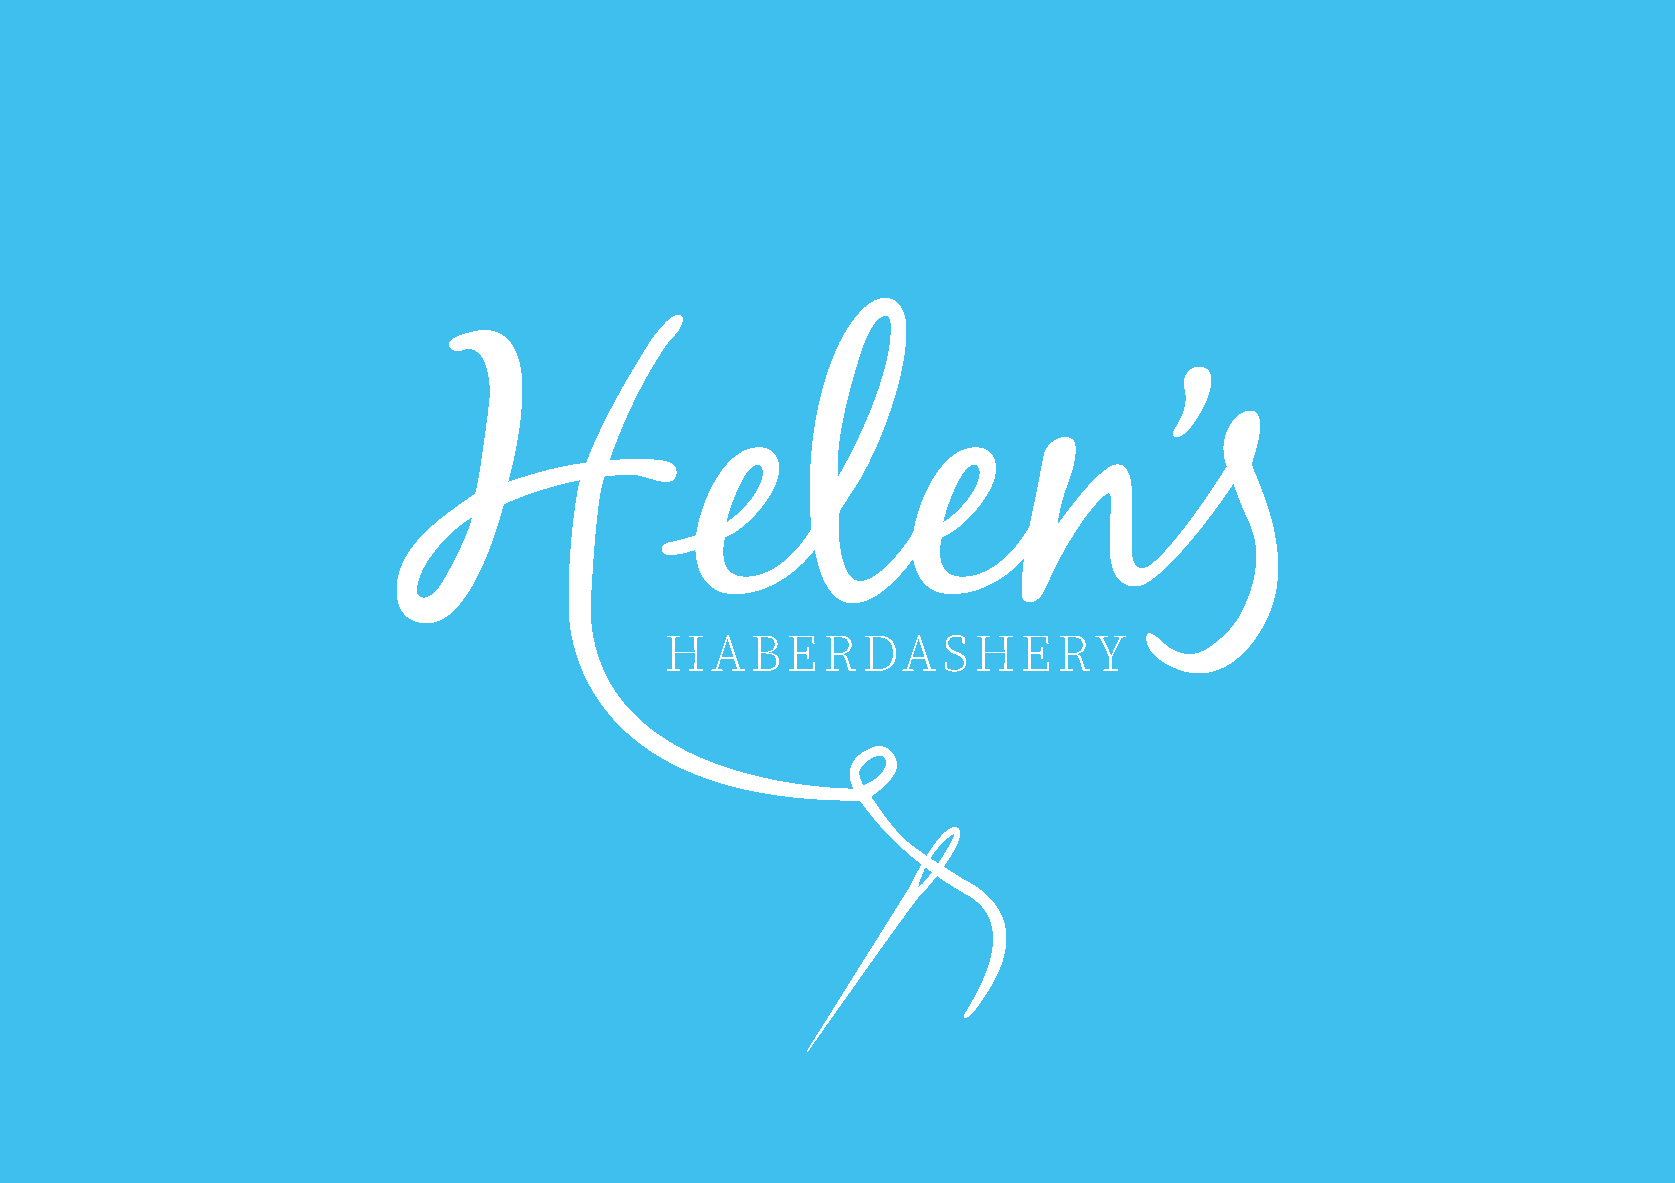 Helen's Haberdashery logo - Blue background